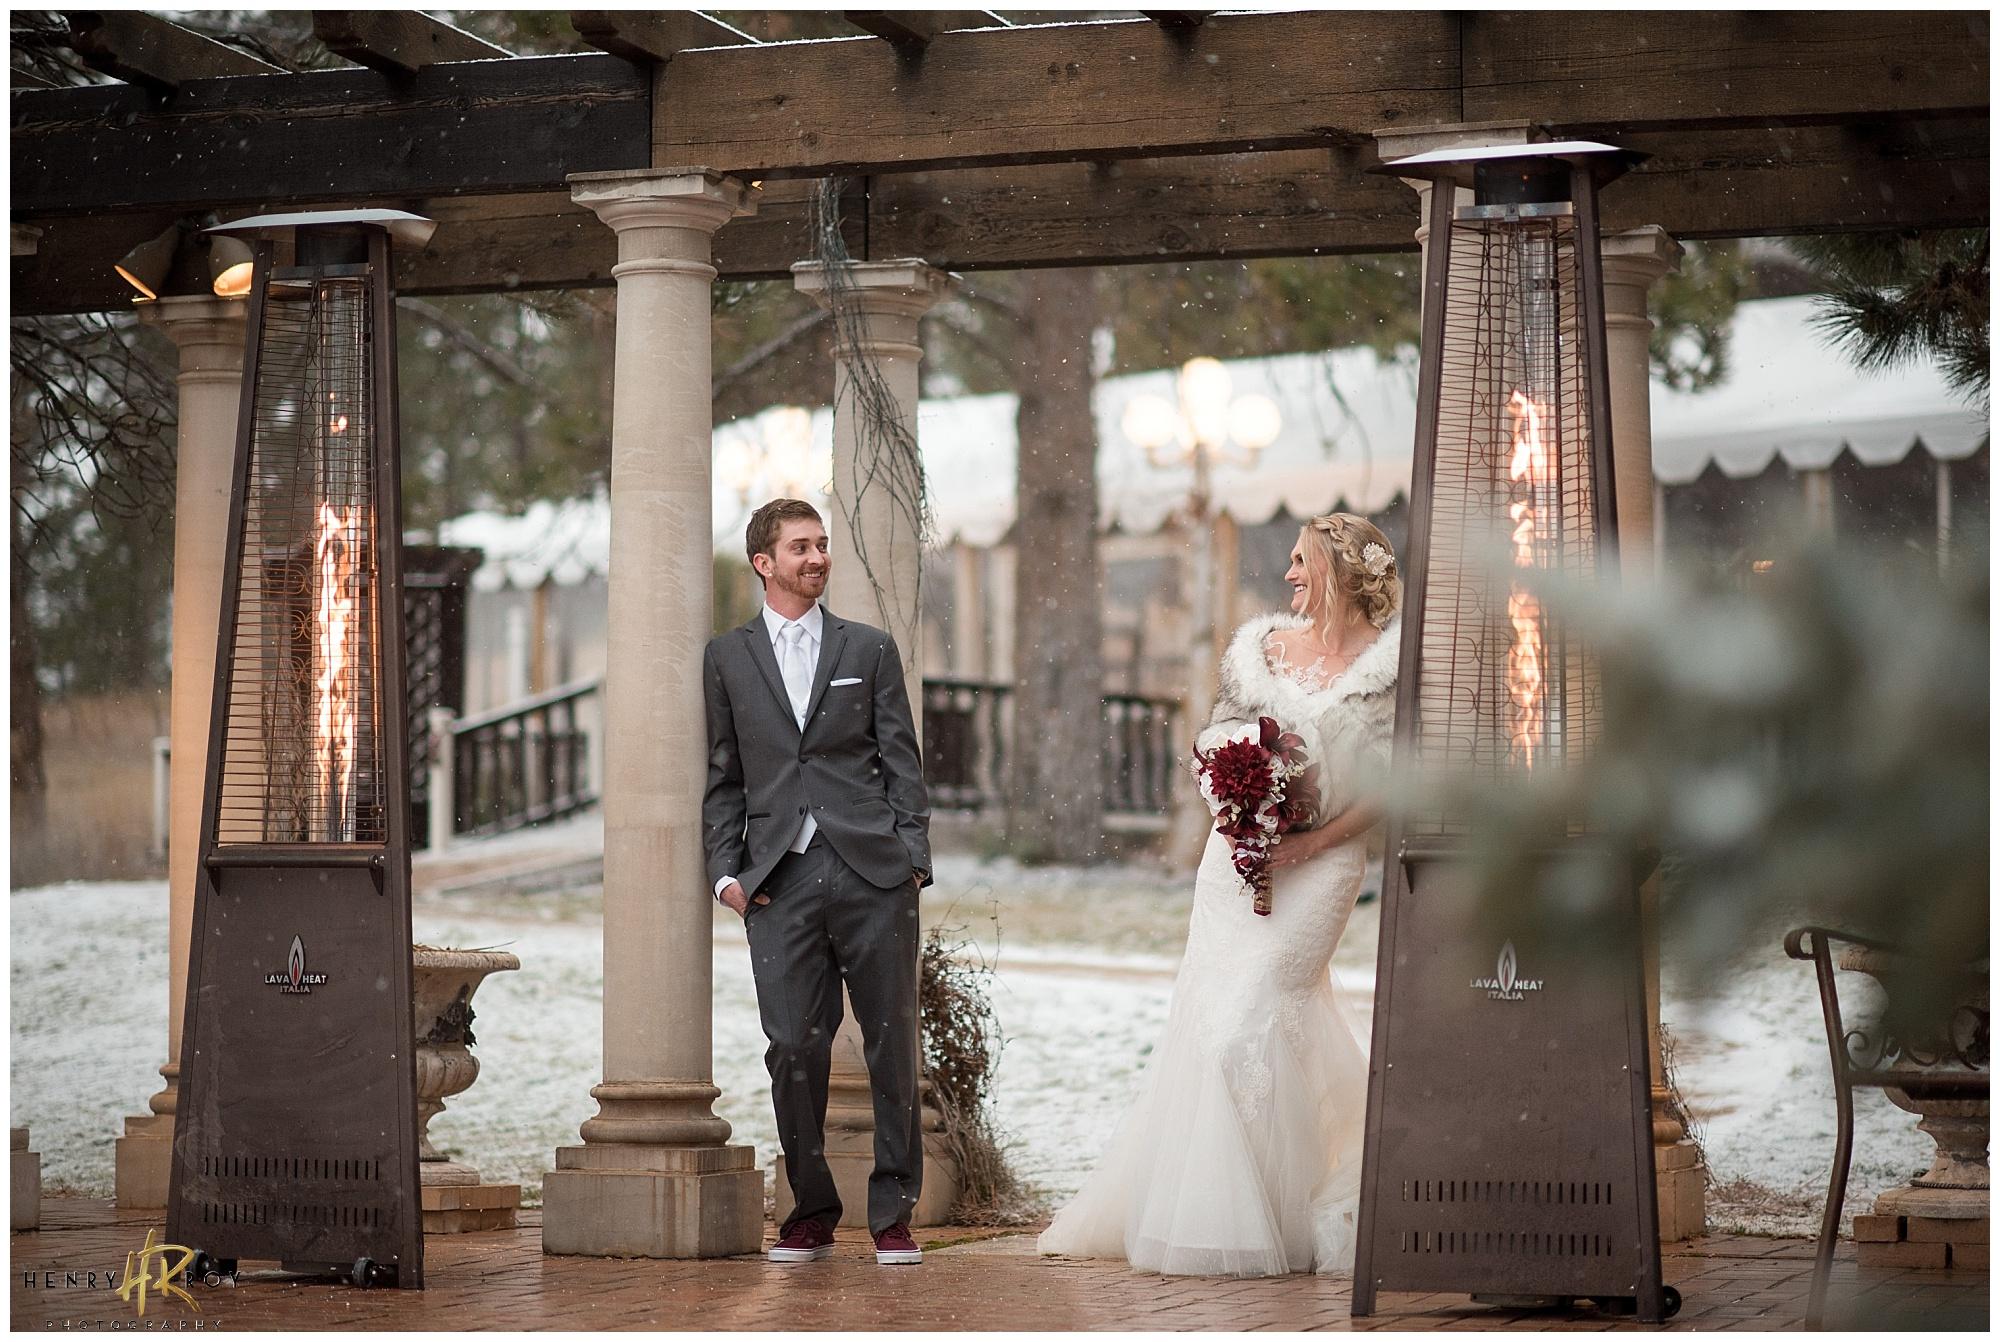 WEDDING PHOTOGRAPHER0037.jpg